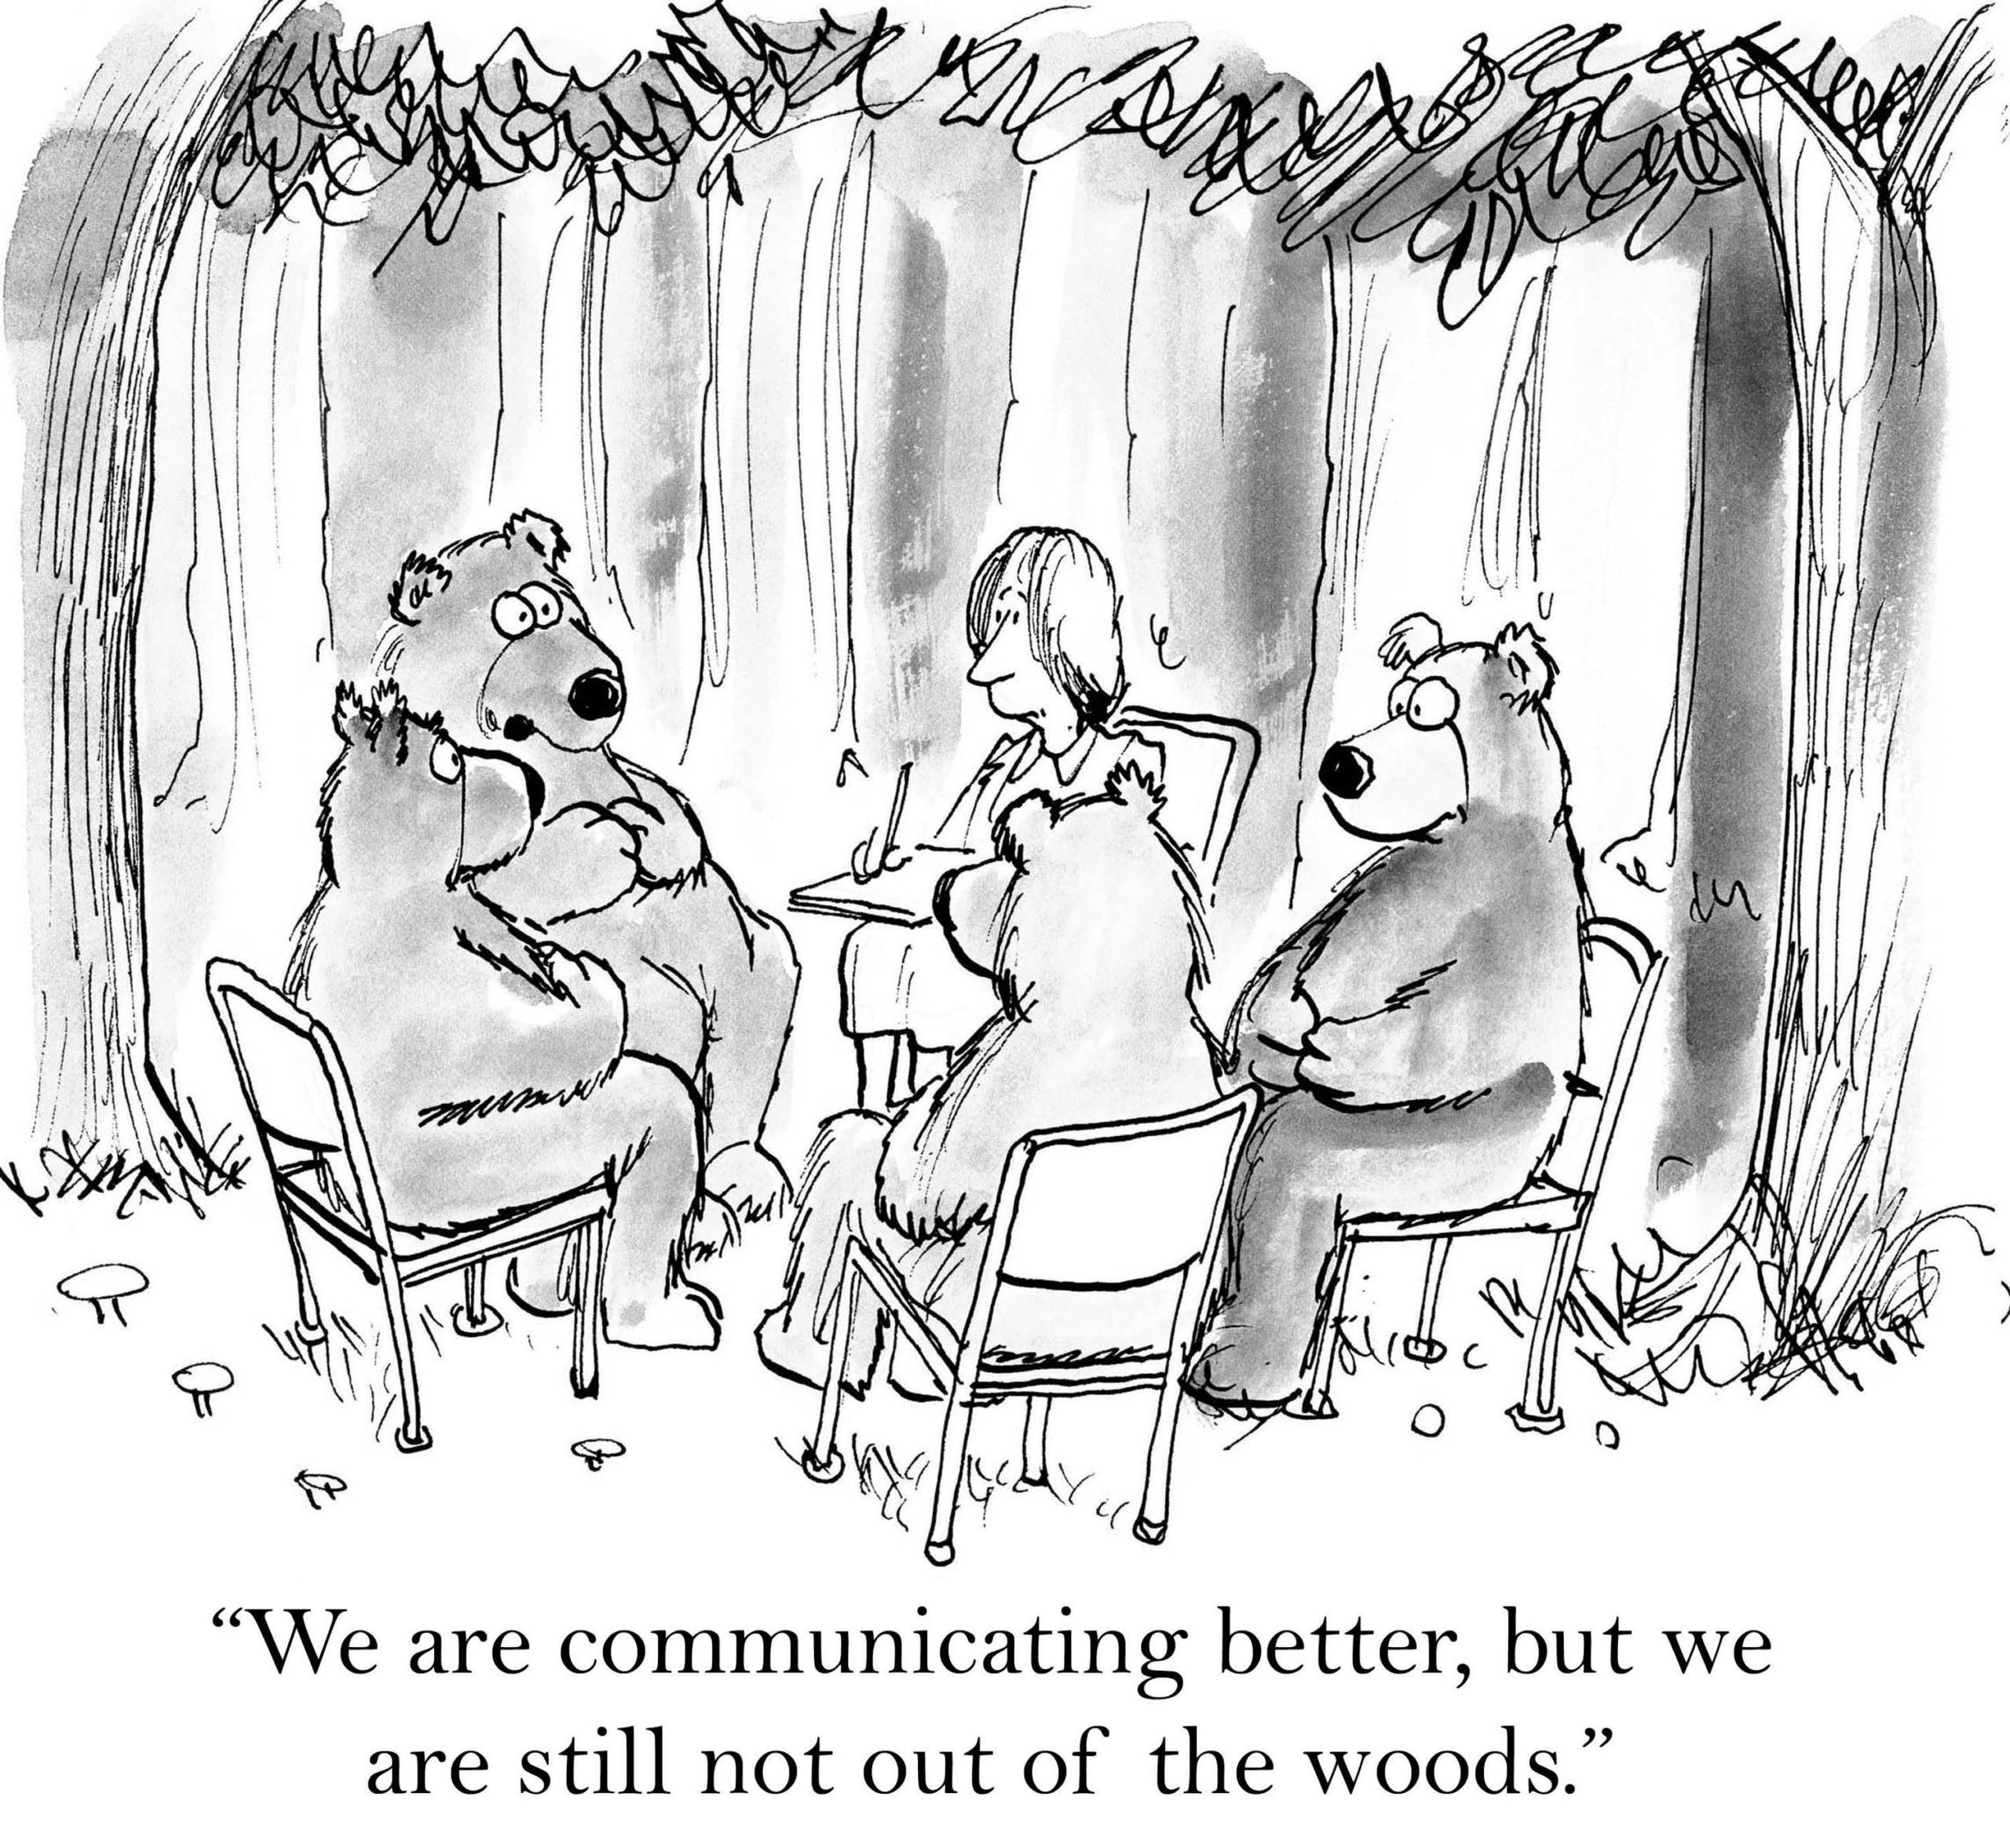 Improved Communication